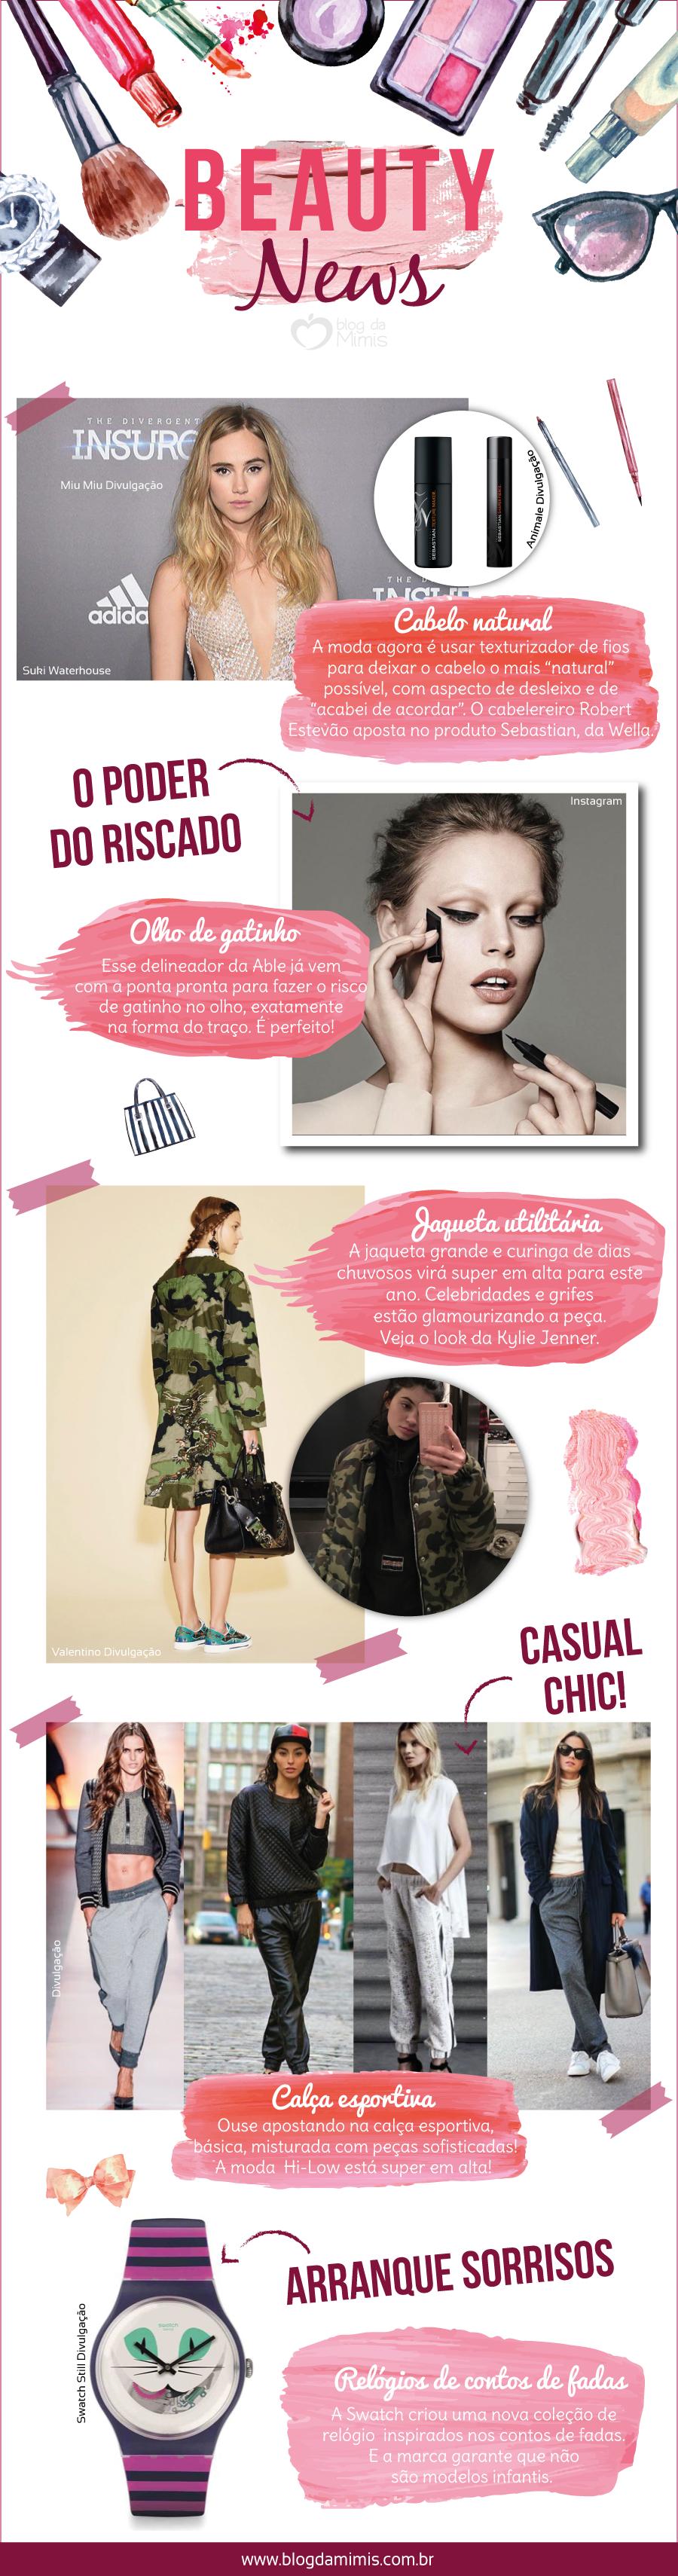 beauty-news-mar-2016-blog-da-mimis-michelle-franzoni-post